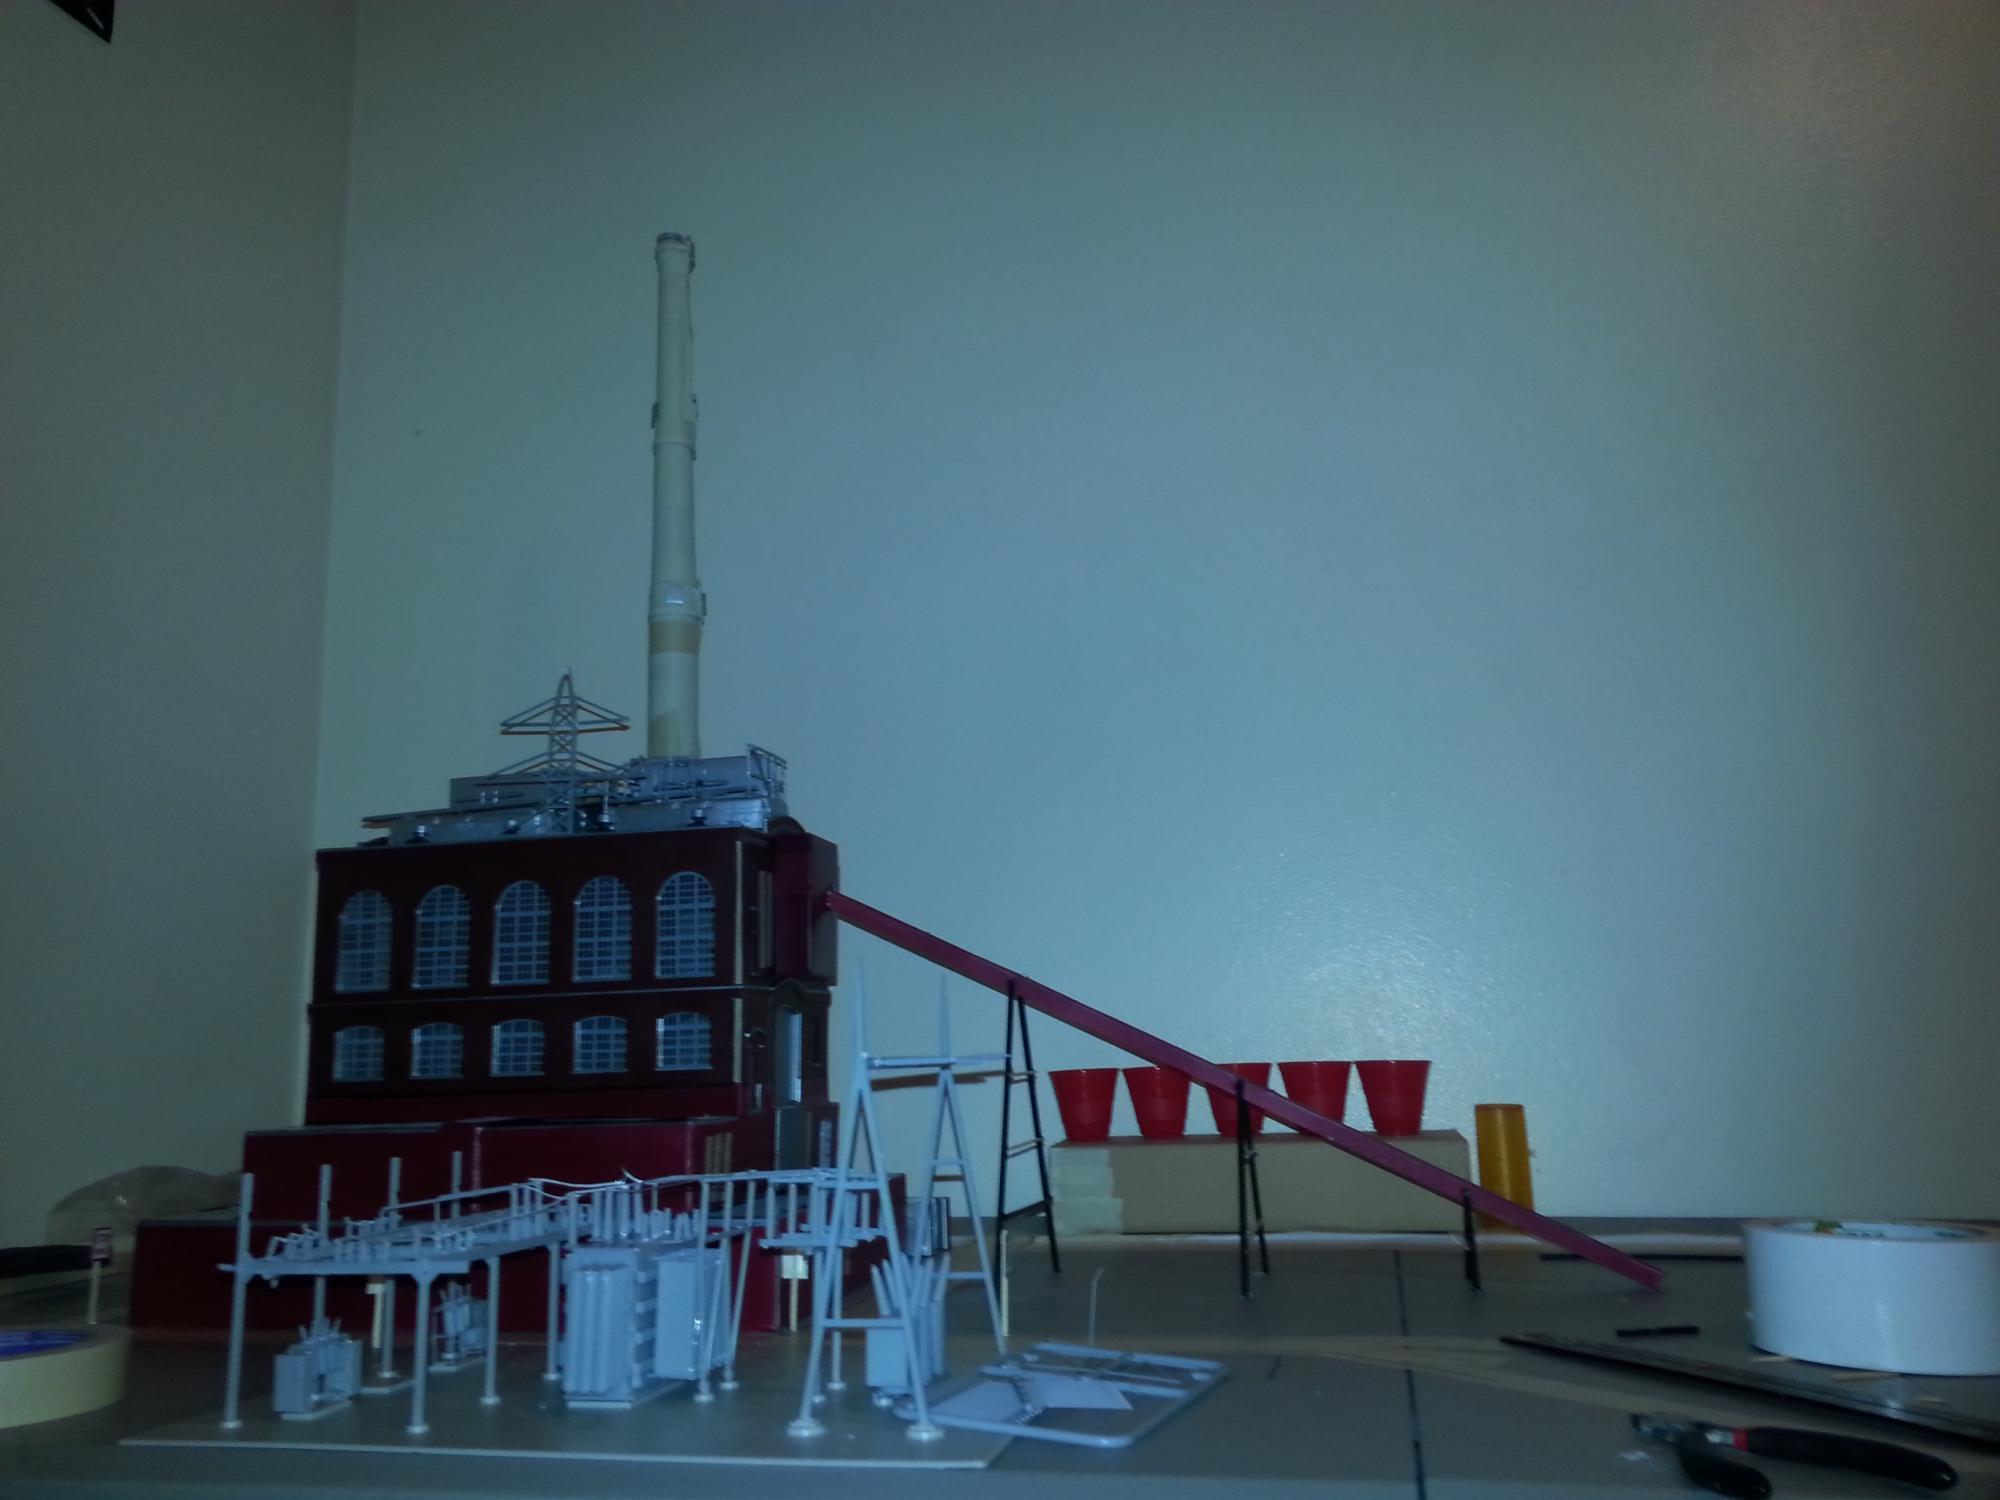 power plants | Model Railroad Hobbyist magazine